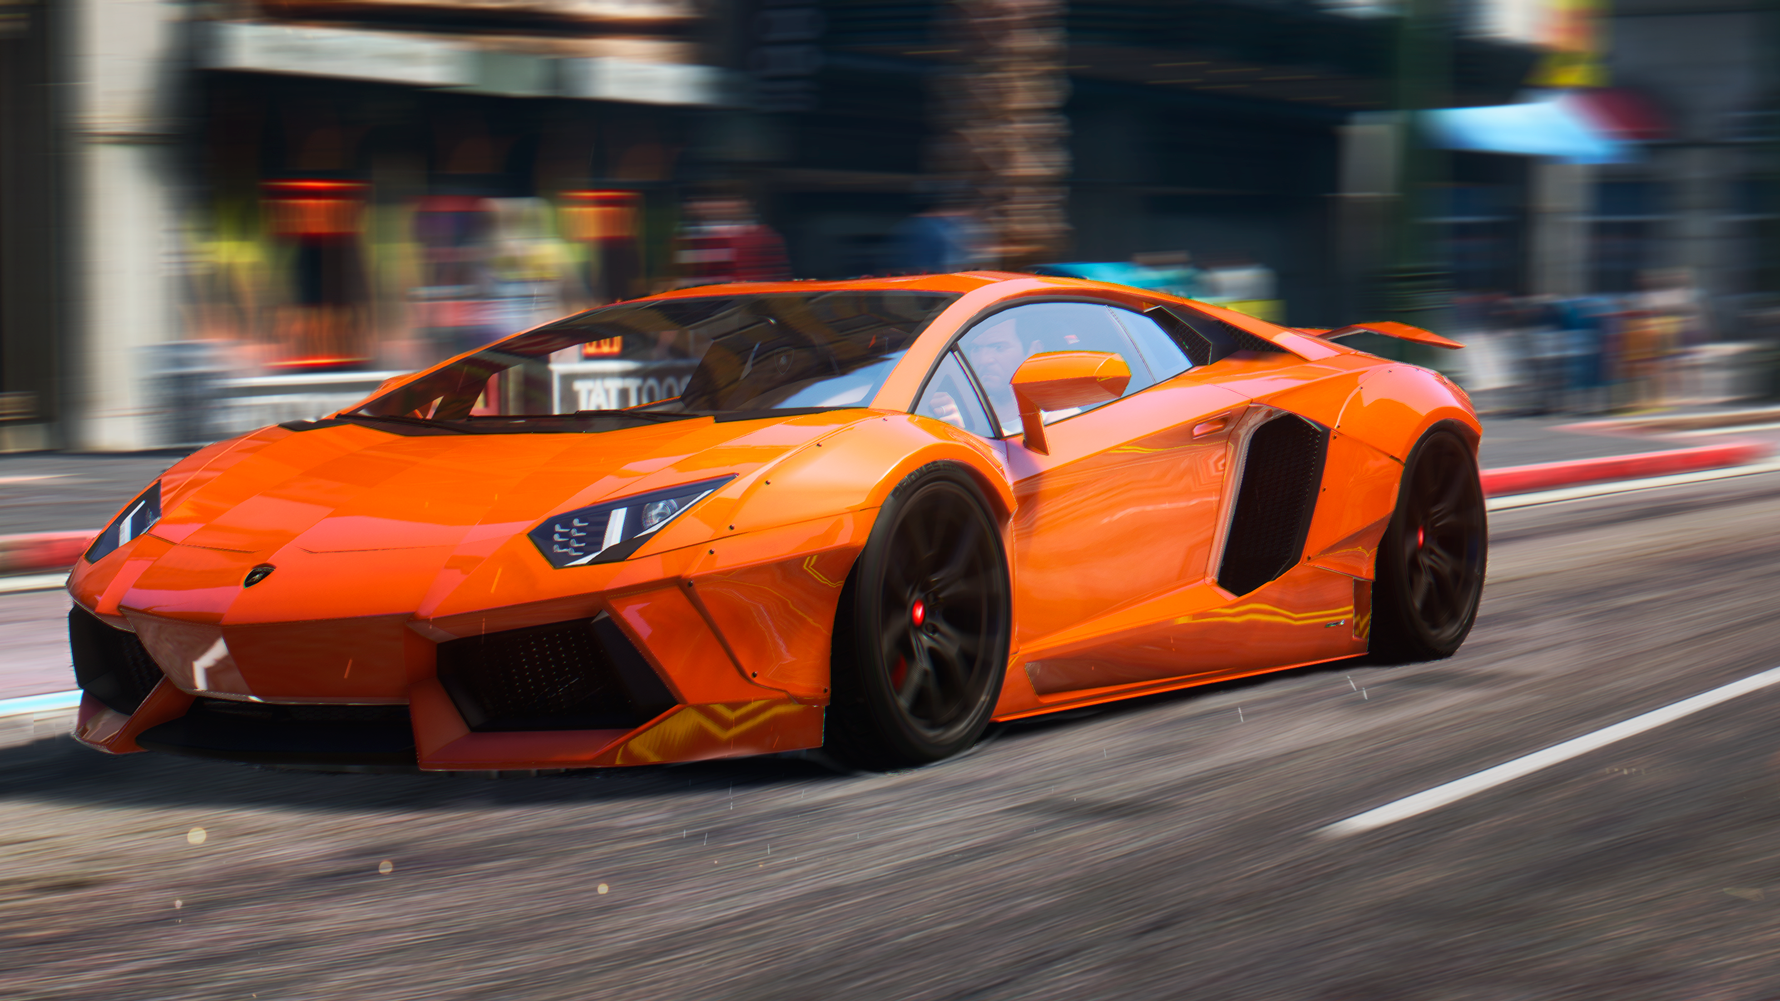 2015 Lamborghini Aventador [Liberty Walk | HQ | Animated Engine | Livery |  Tuning | AutoSpoiler]   GTA5 Mods.com